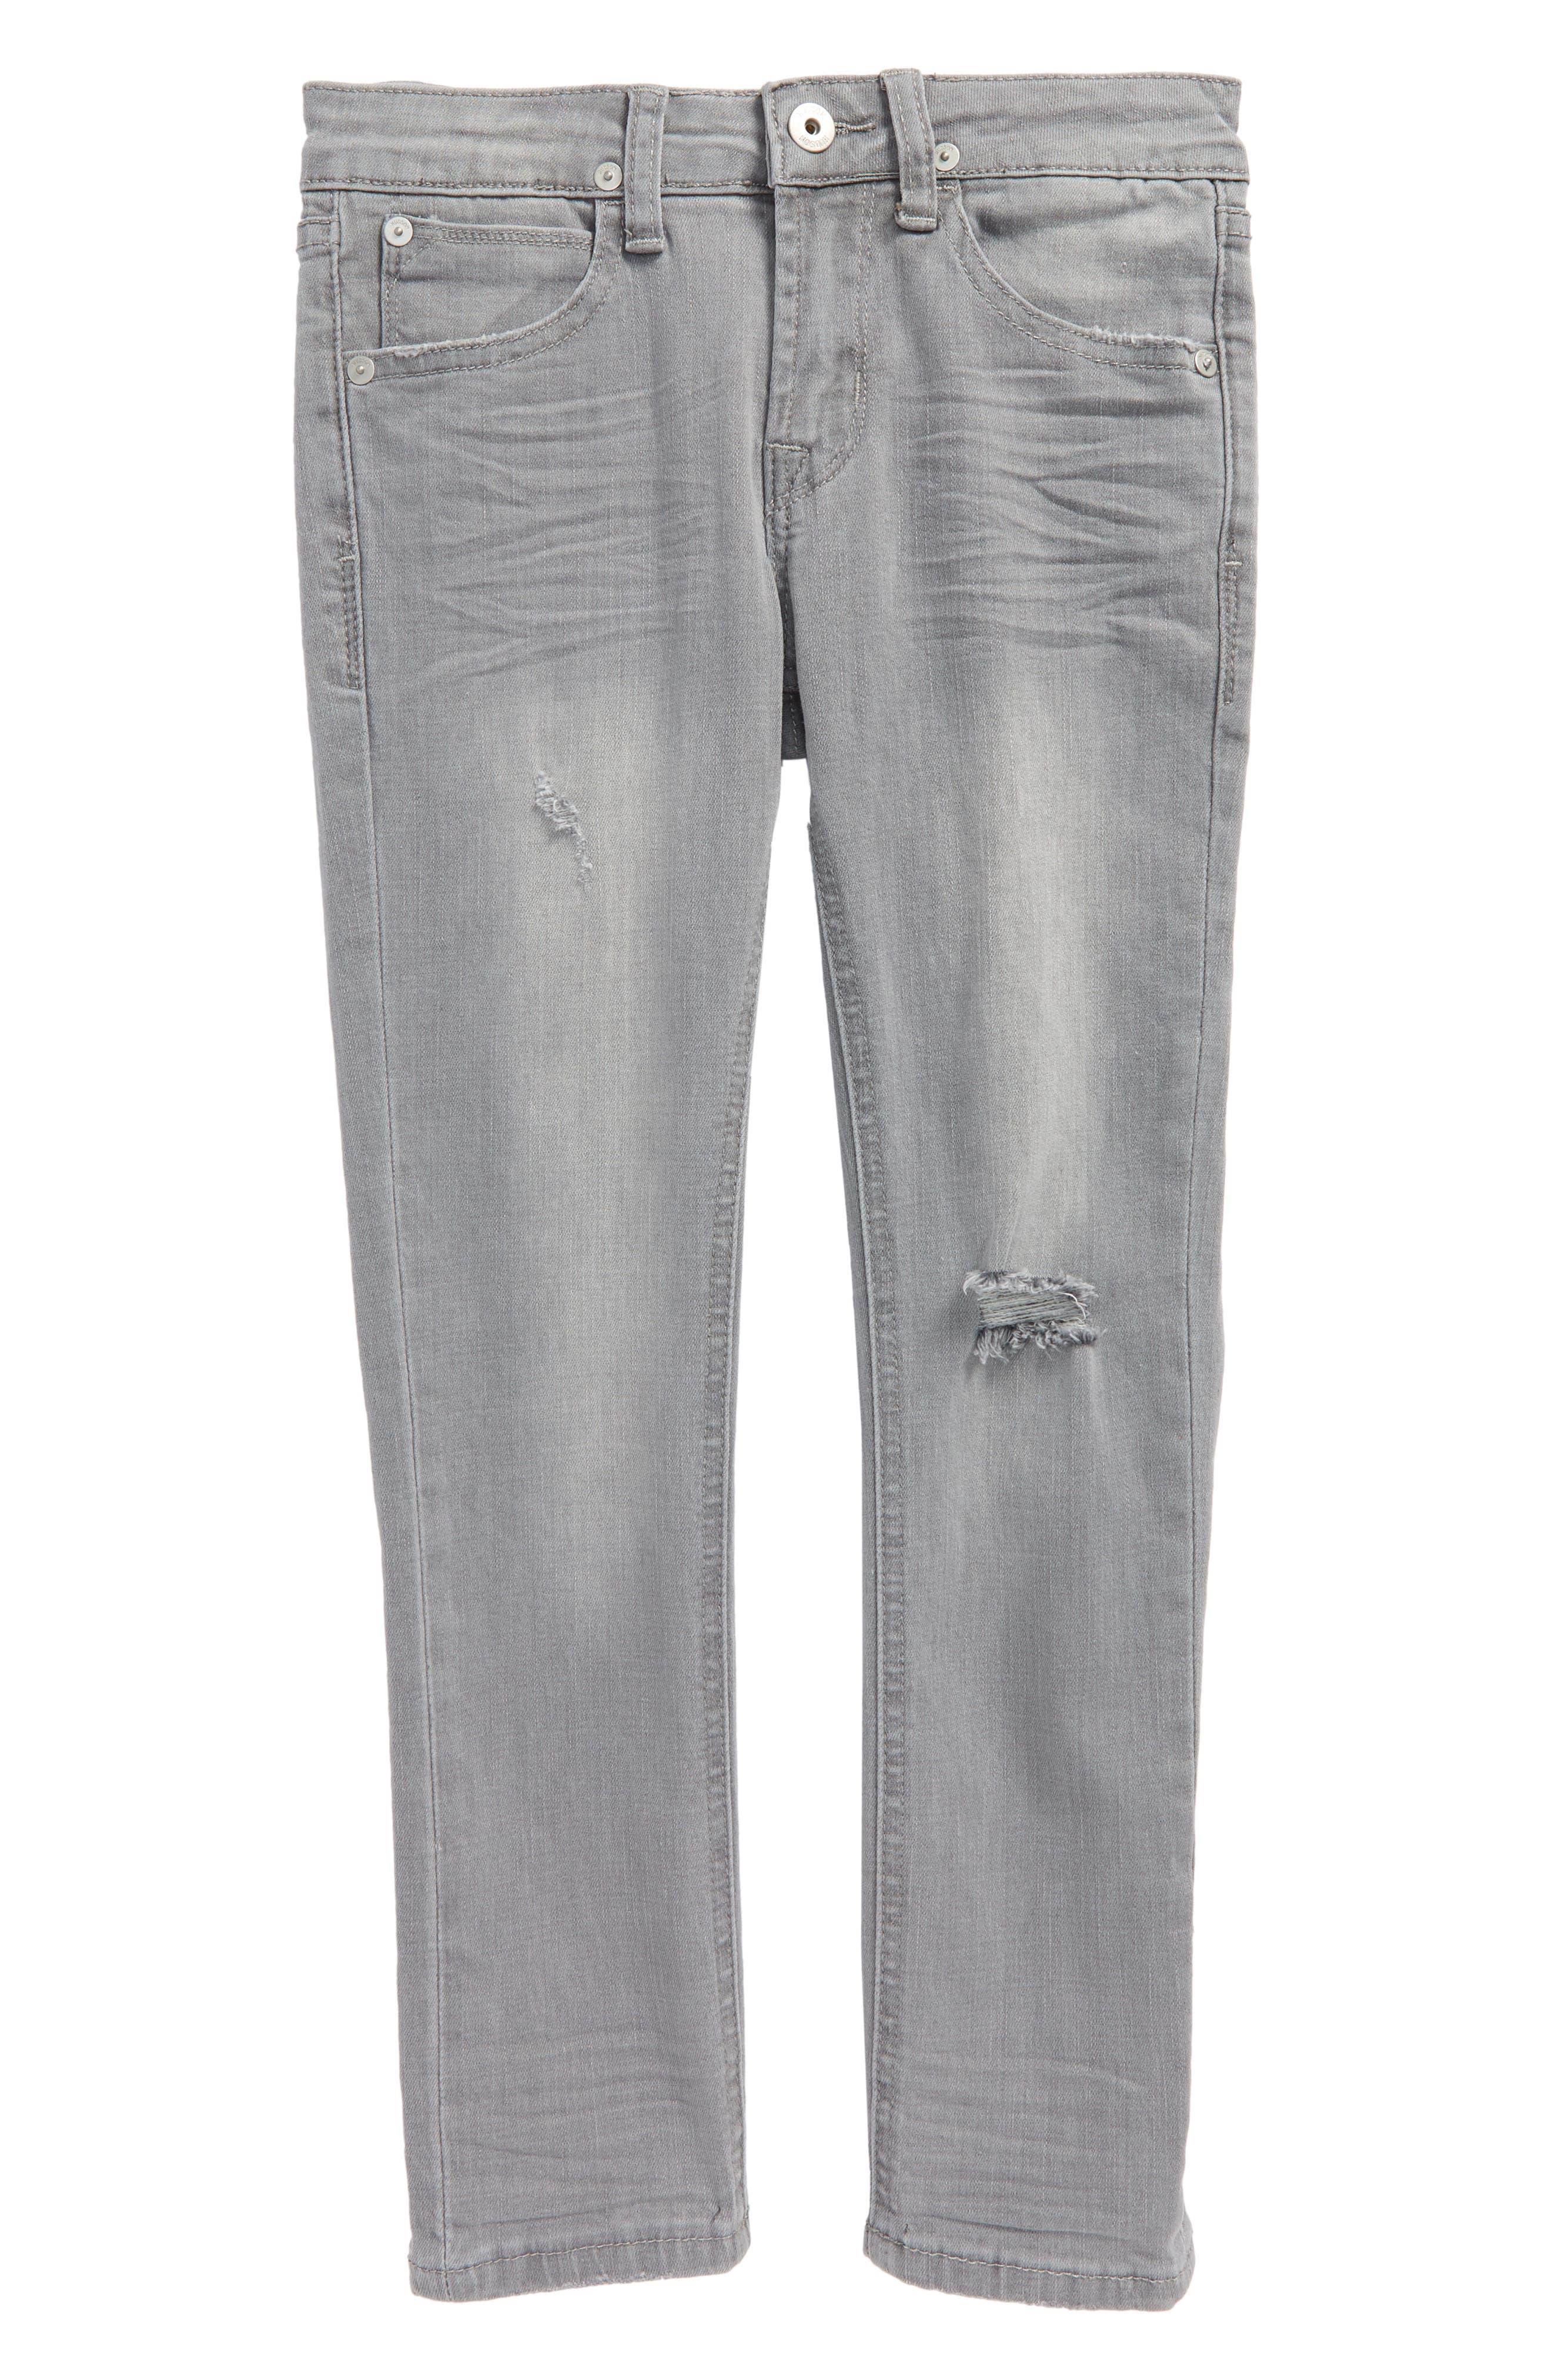 Alternate Image 1 Selected - Hudson Kids Jude Slim Fit Skinny Jeans (Toddler Boys & Little Boys)